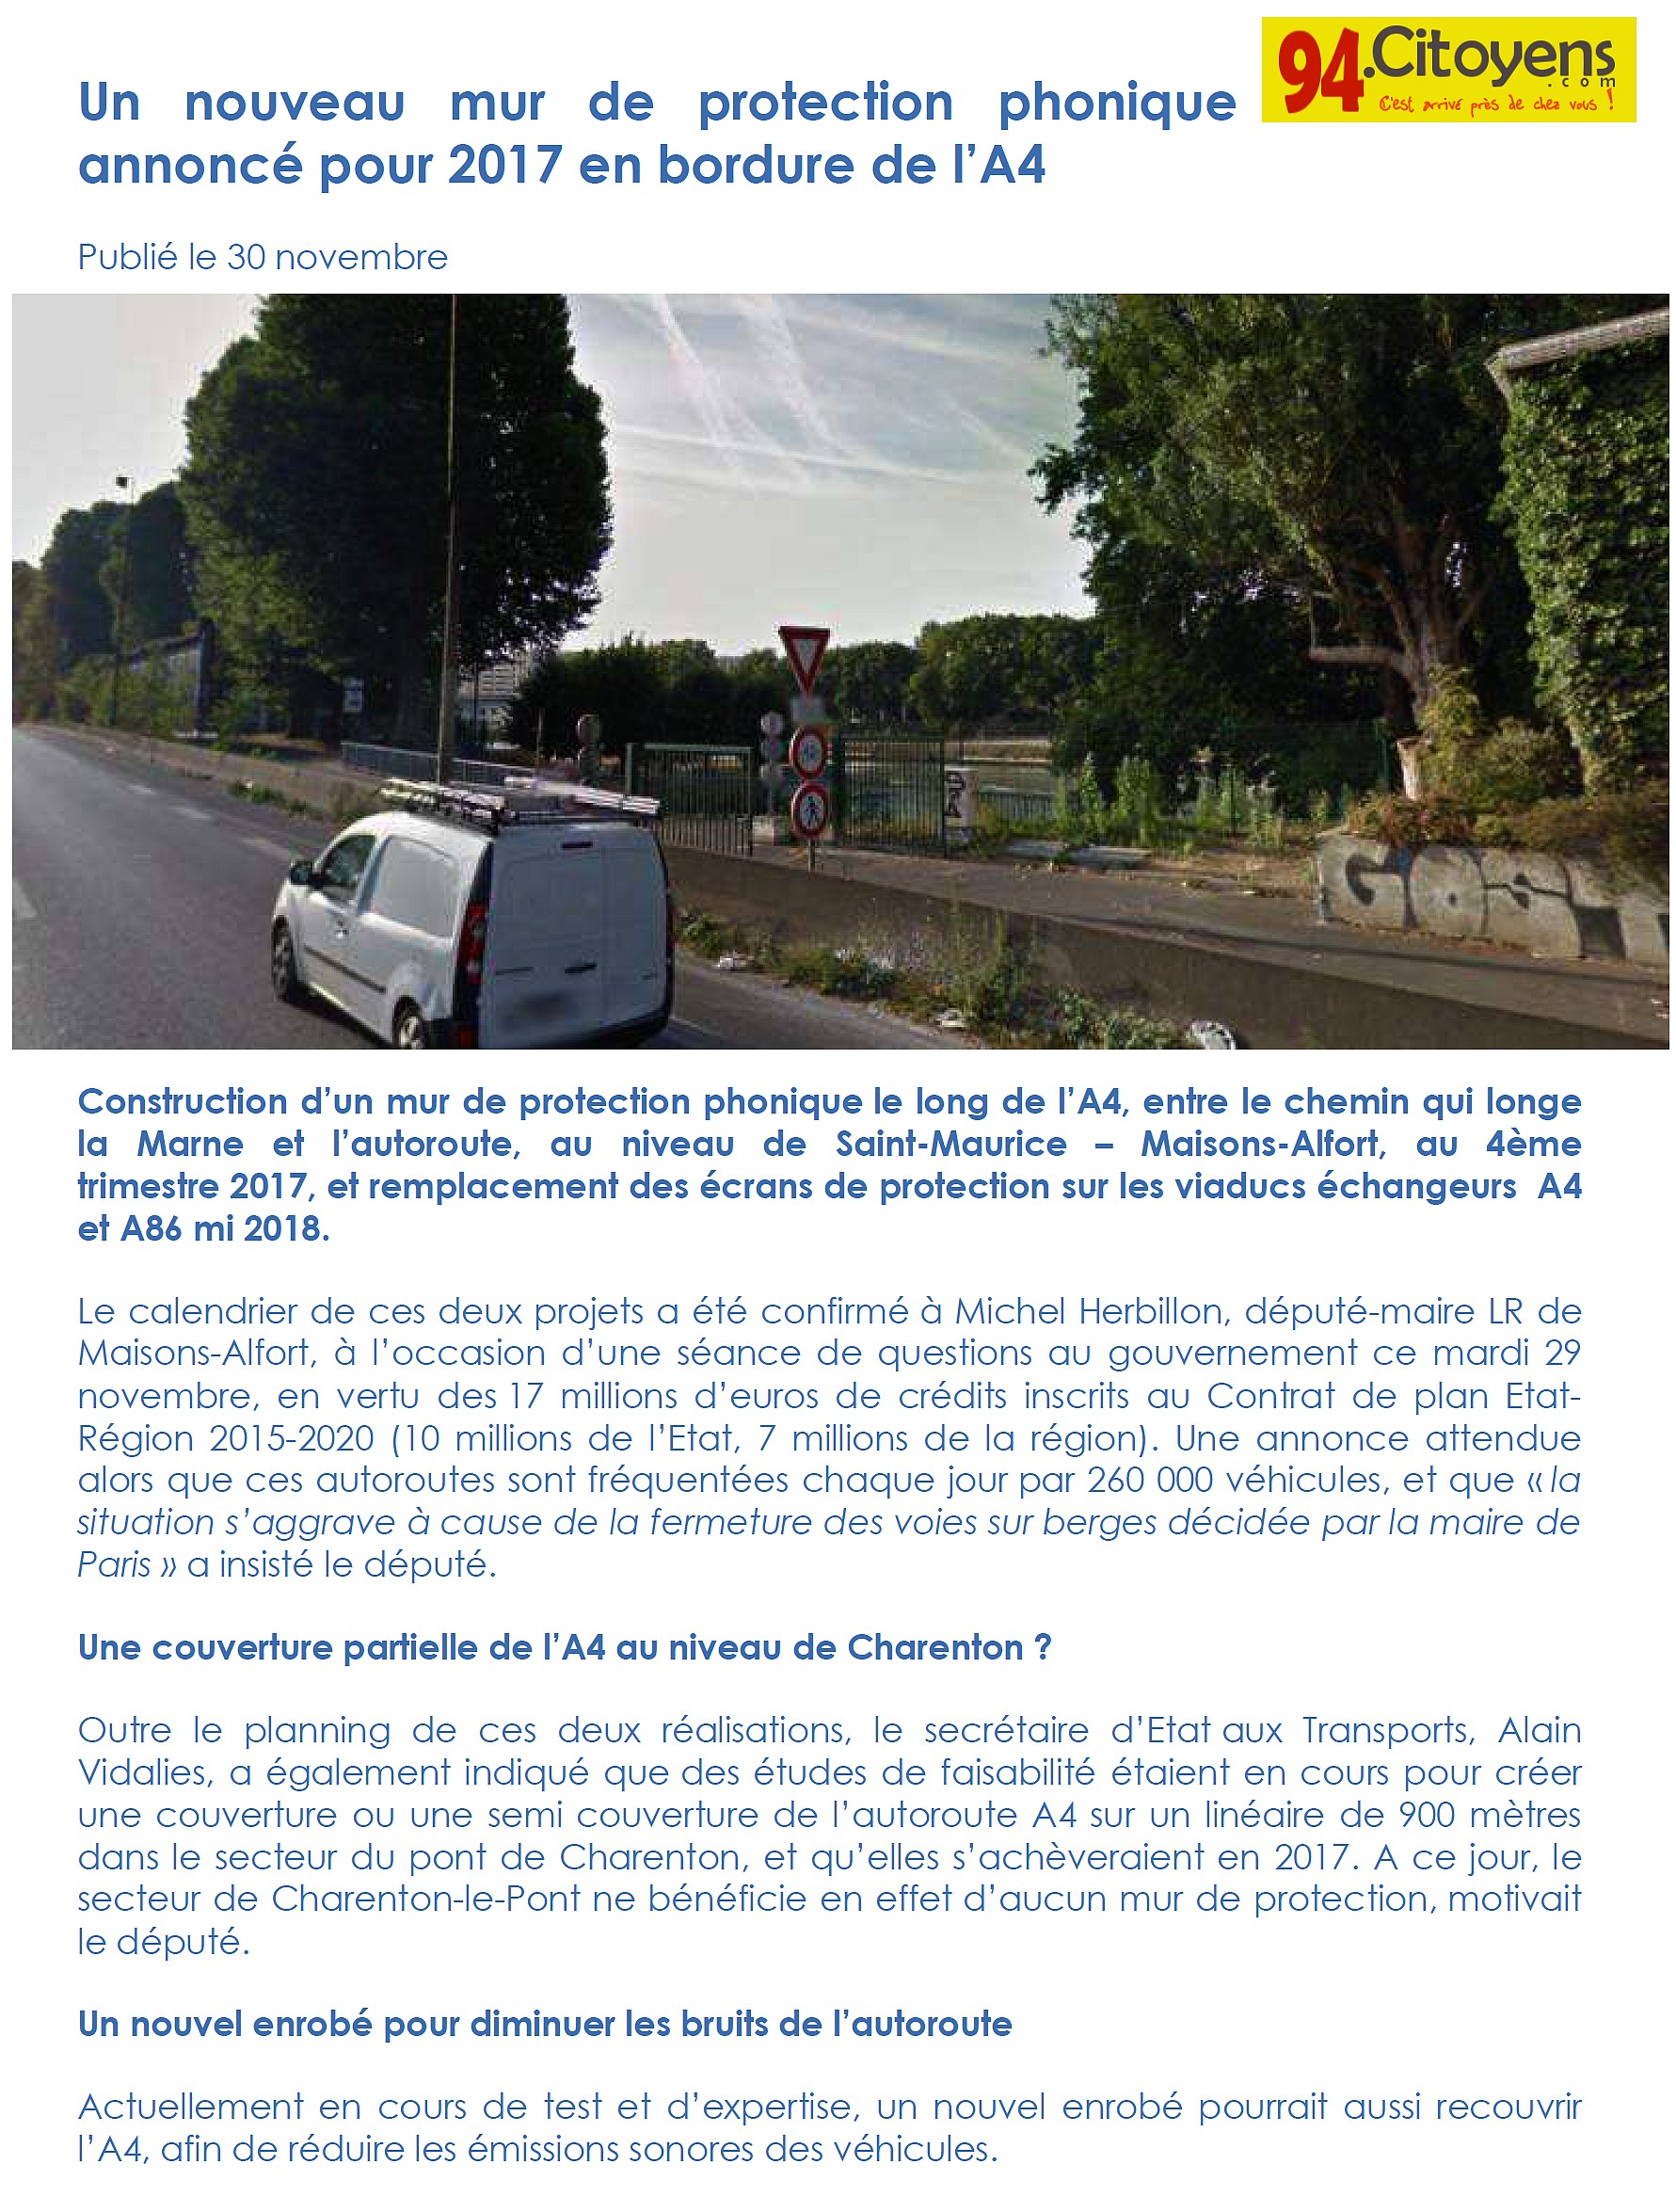 citoyens-94-301116